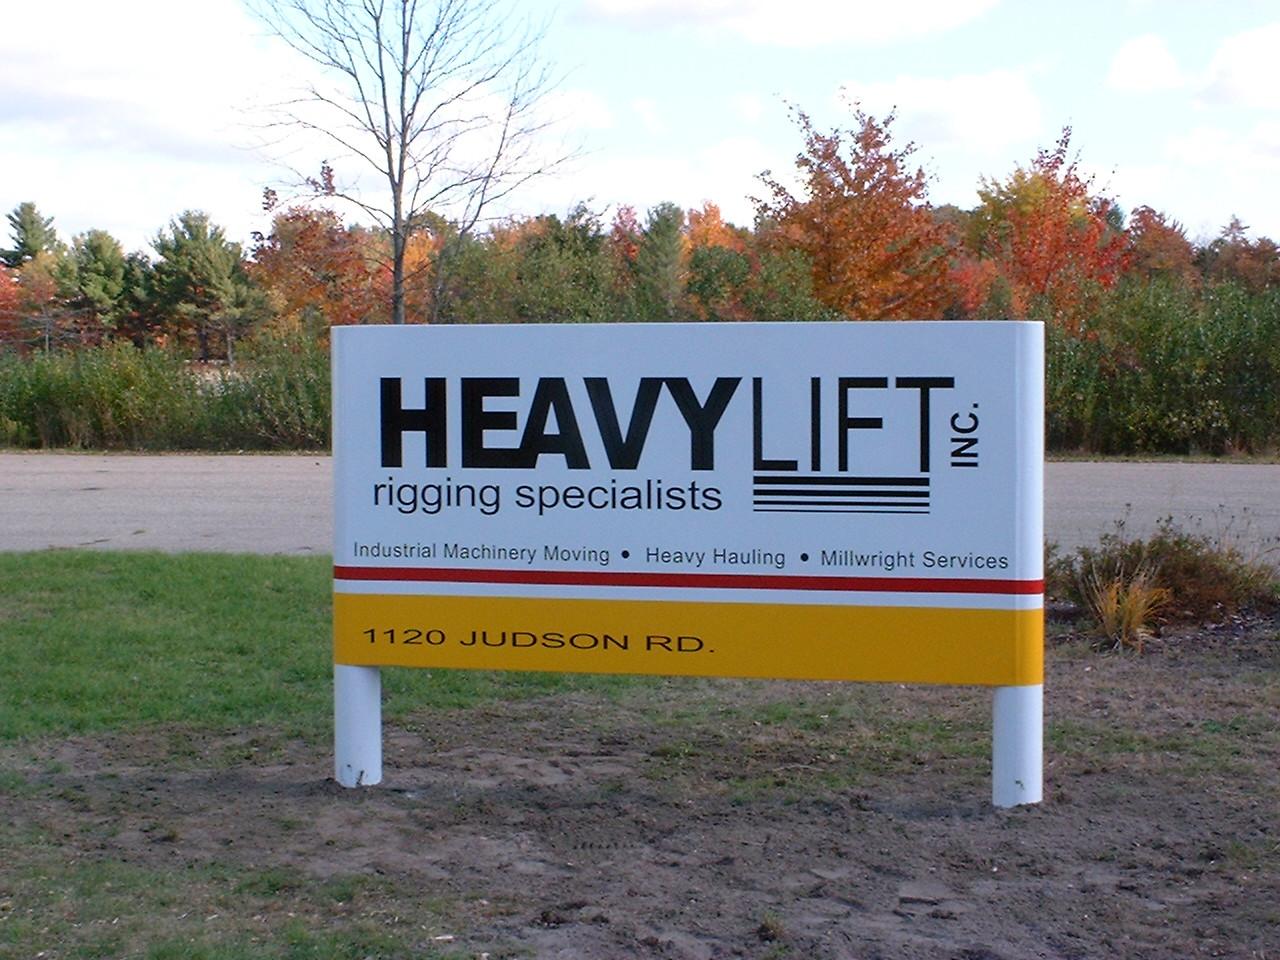 HeavyLift